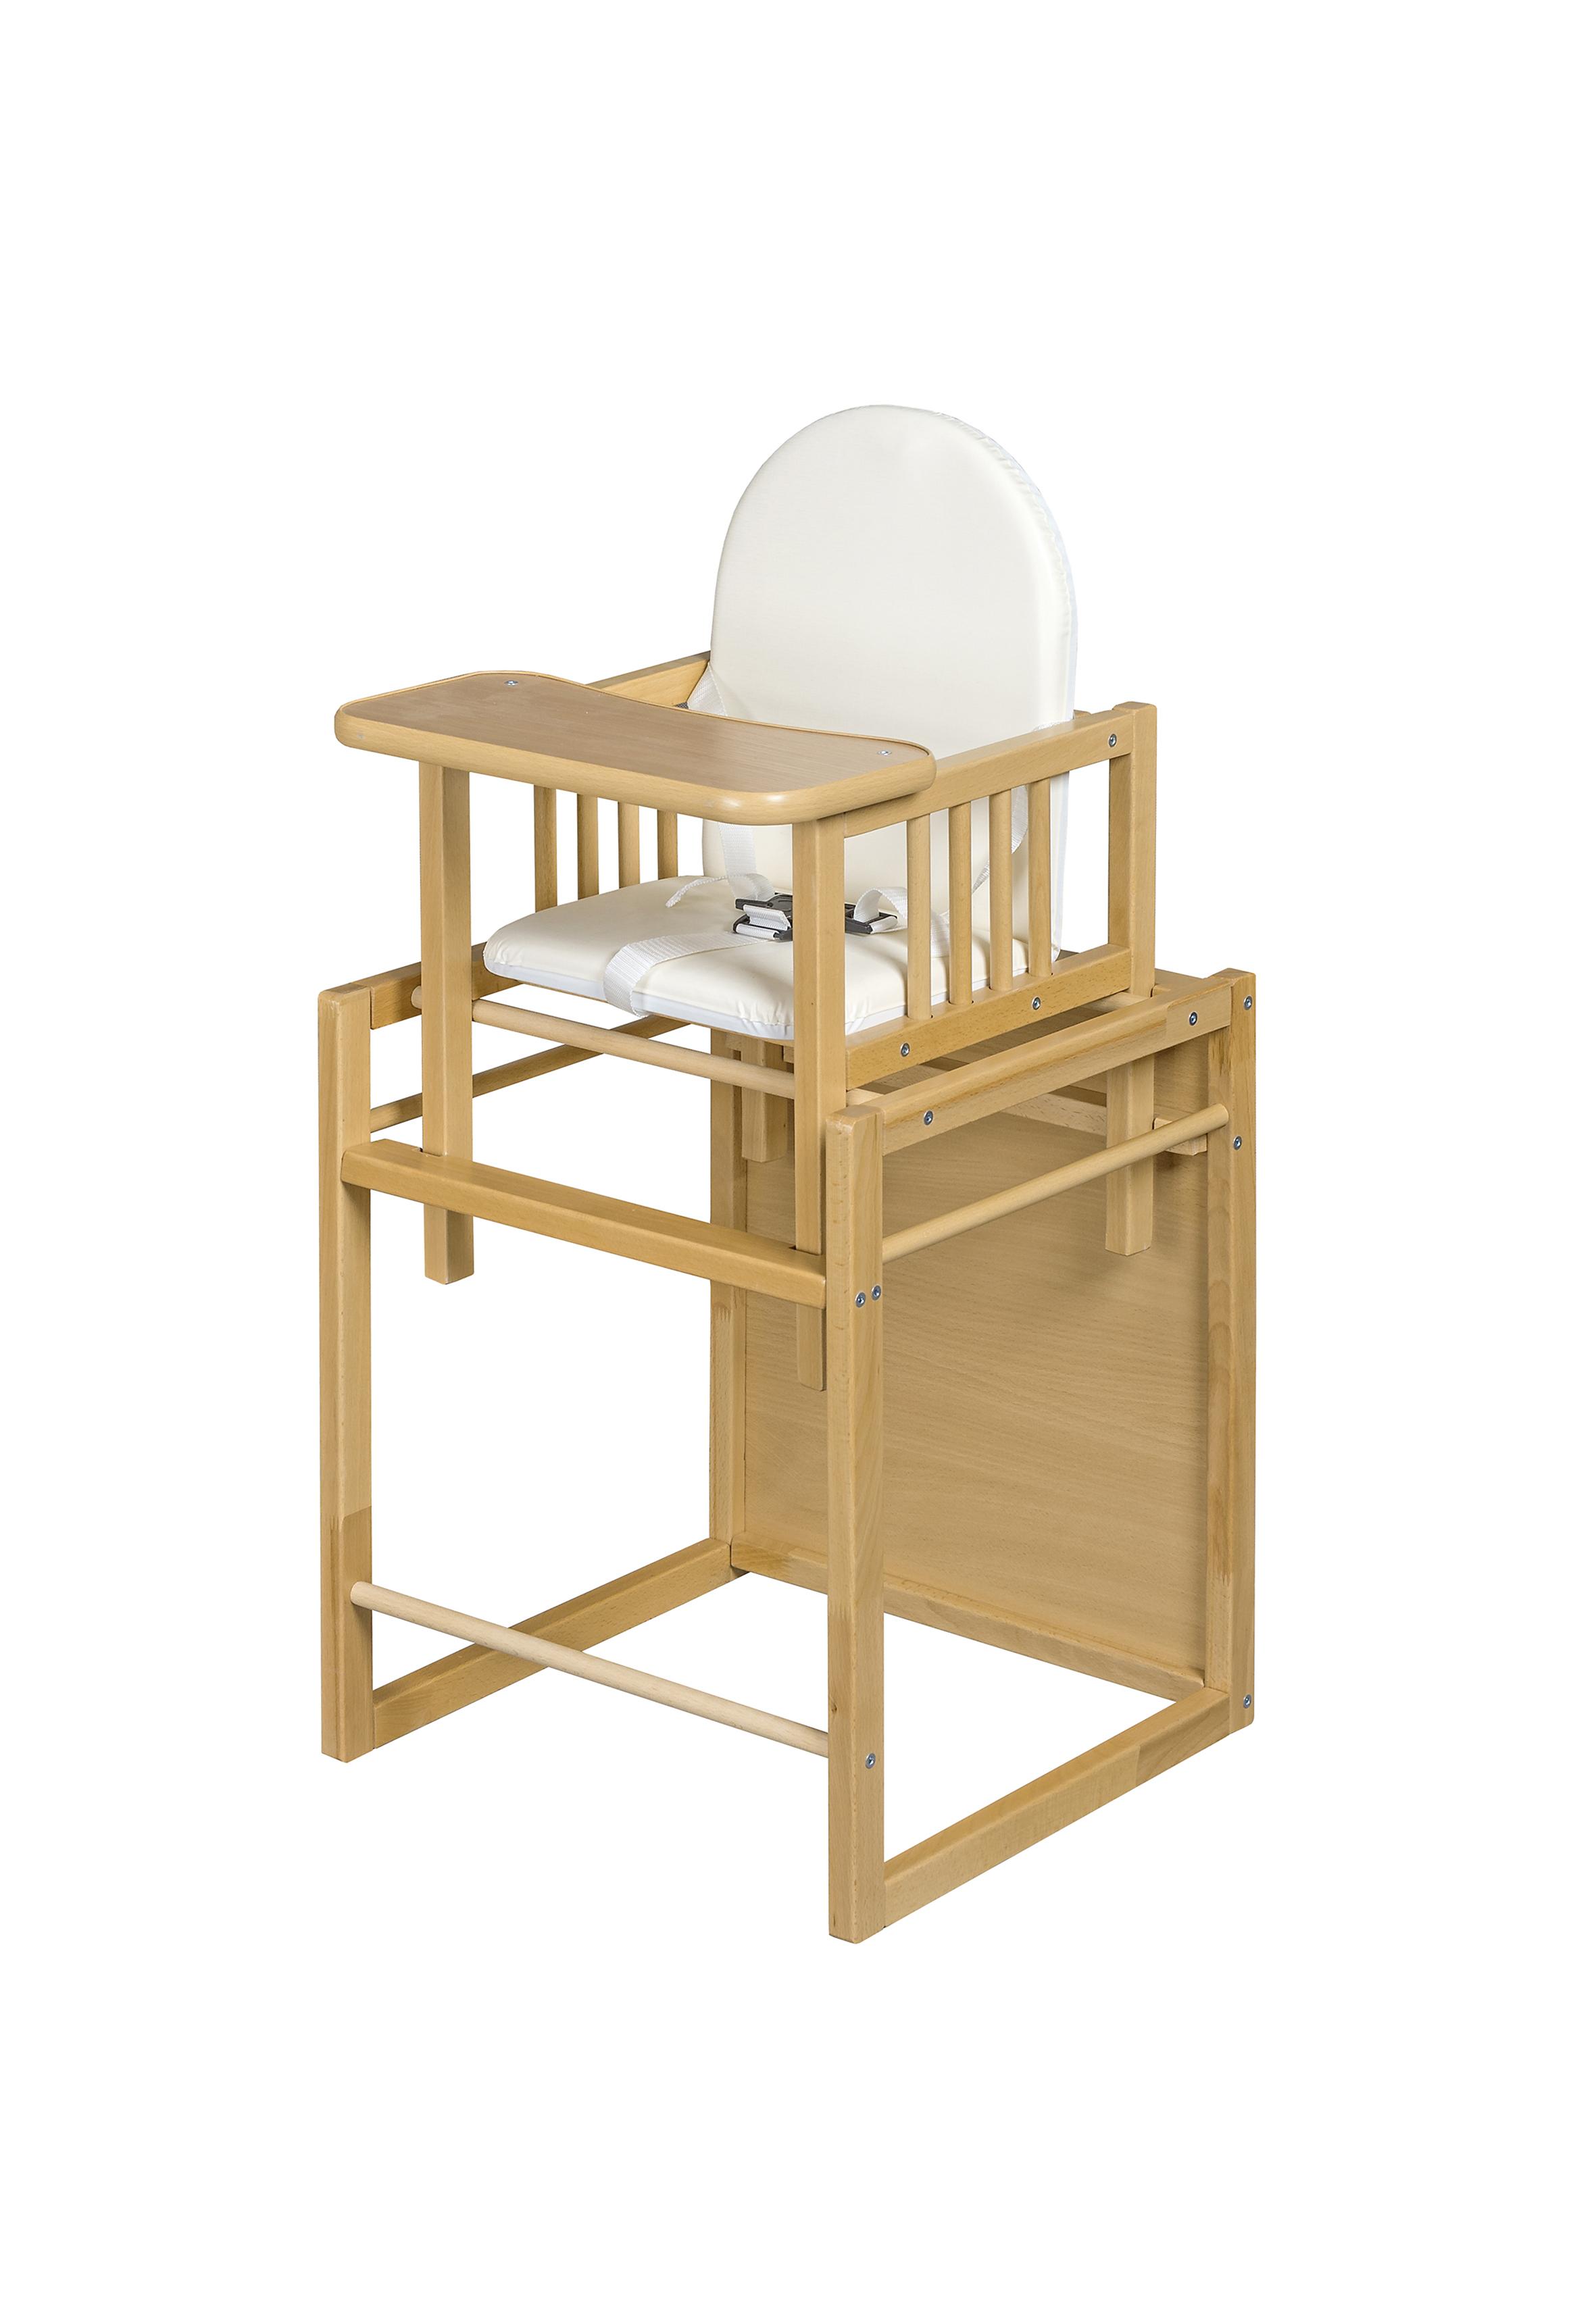 best for kids kinderhochstuhl kombihochstuhl babyhochstuhl hochstuhl stuhl holz ebay. Black Bedroom Furniture Sets. Home Design Ideas